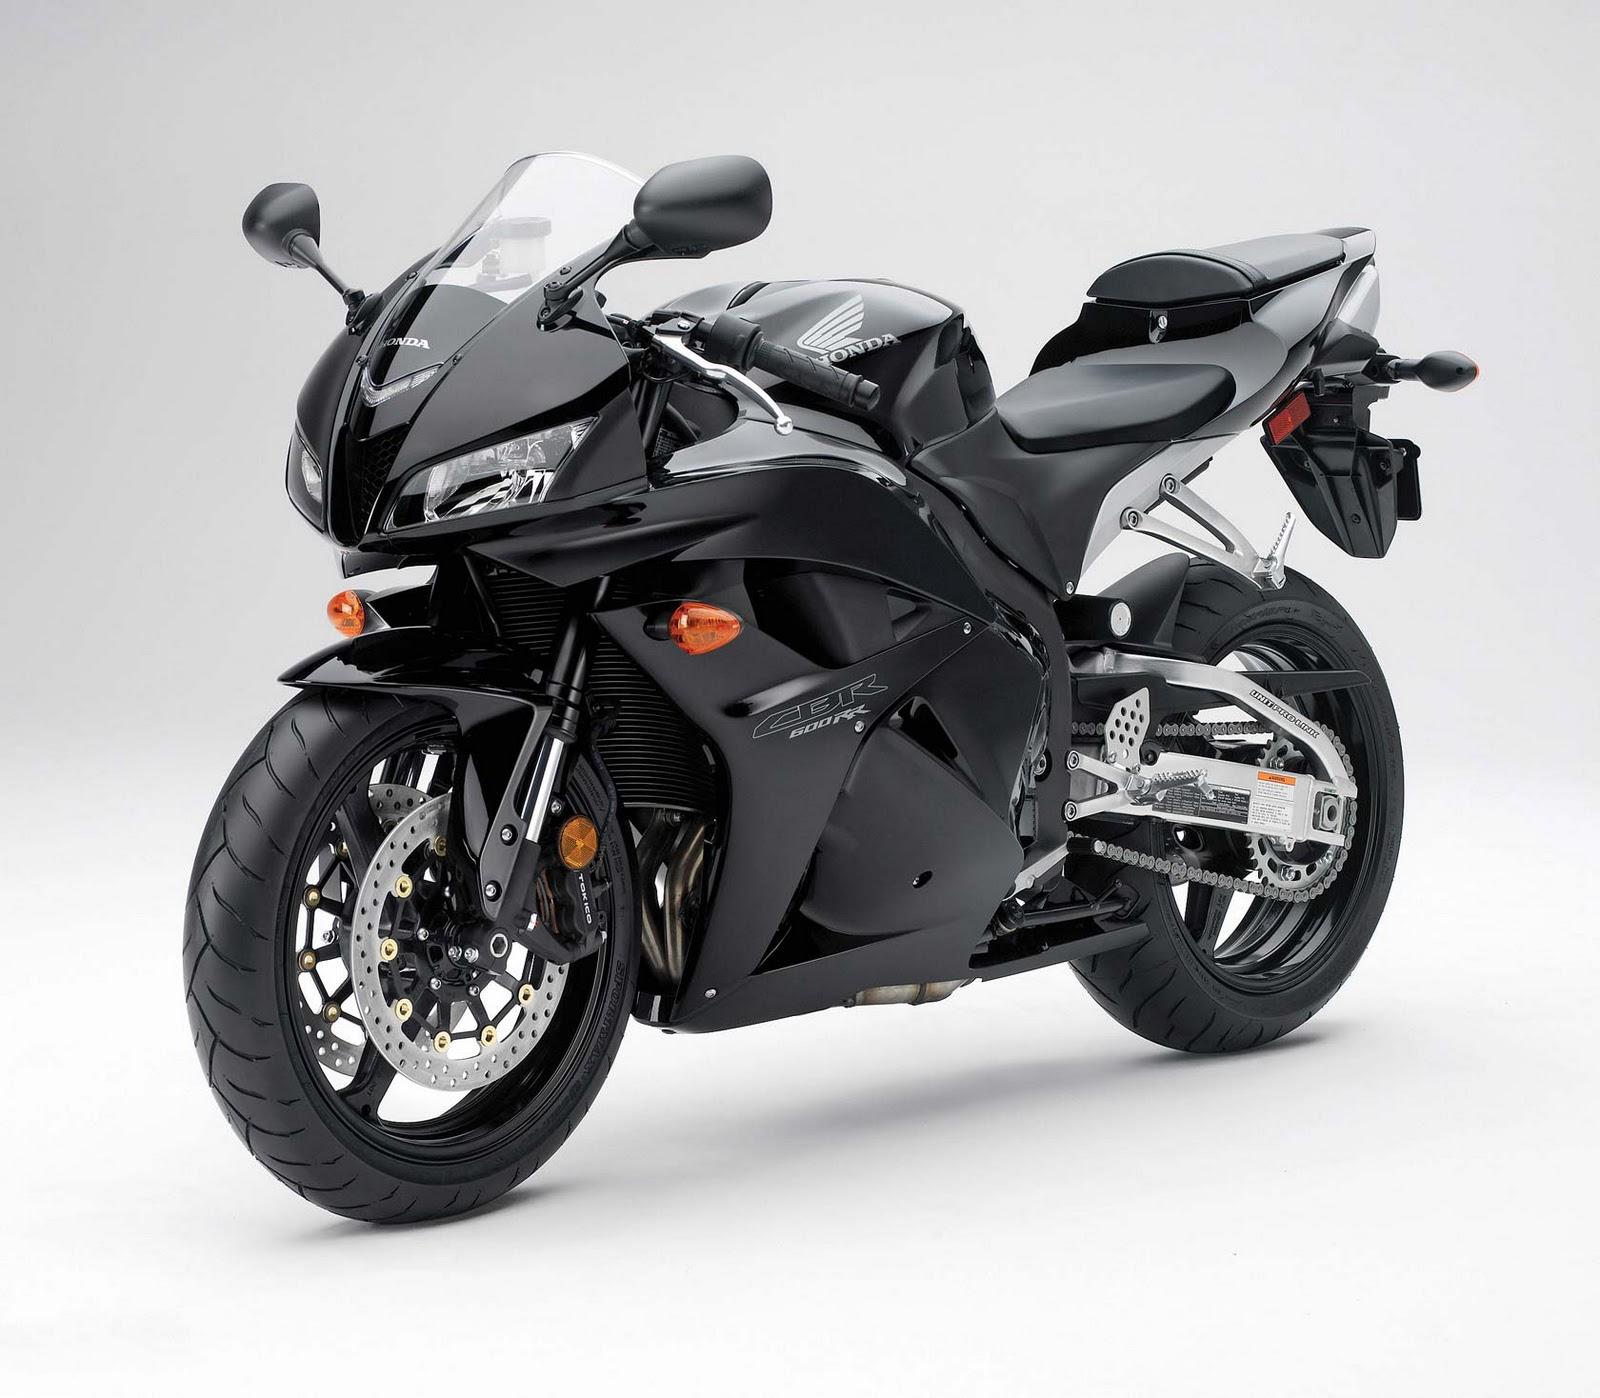 honda motorcycle pictures honda cbr 600 rr 2011. Black Bedroom Furniture Sets. Home Design Ideas